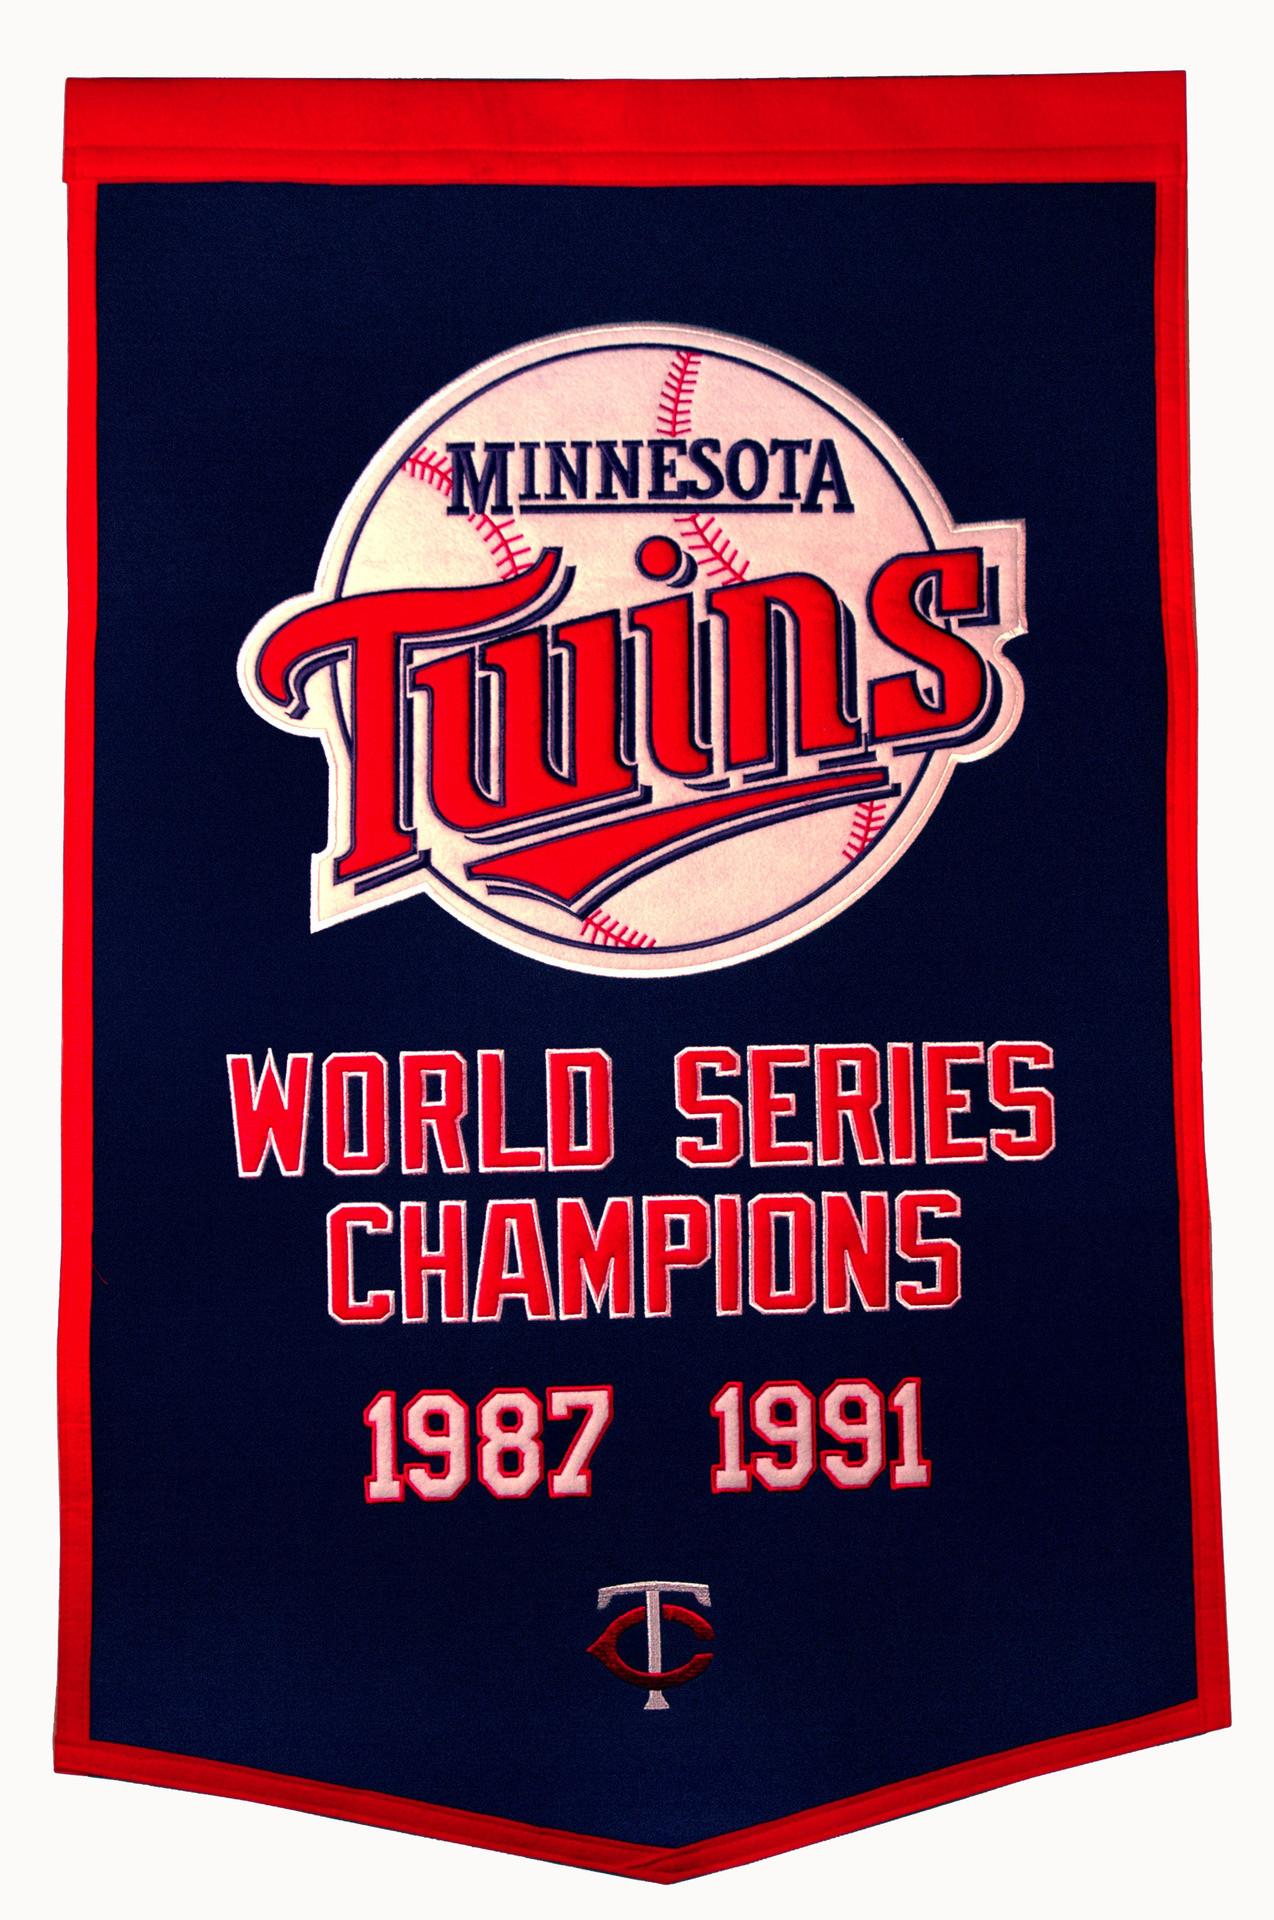 Minnesota Twins World Series Champions 1987 & 1991